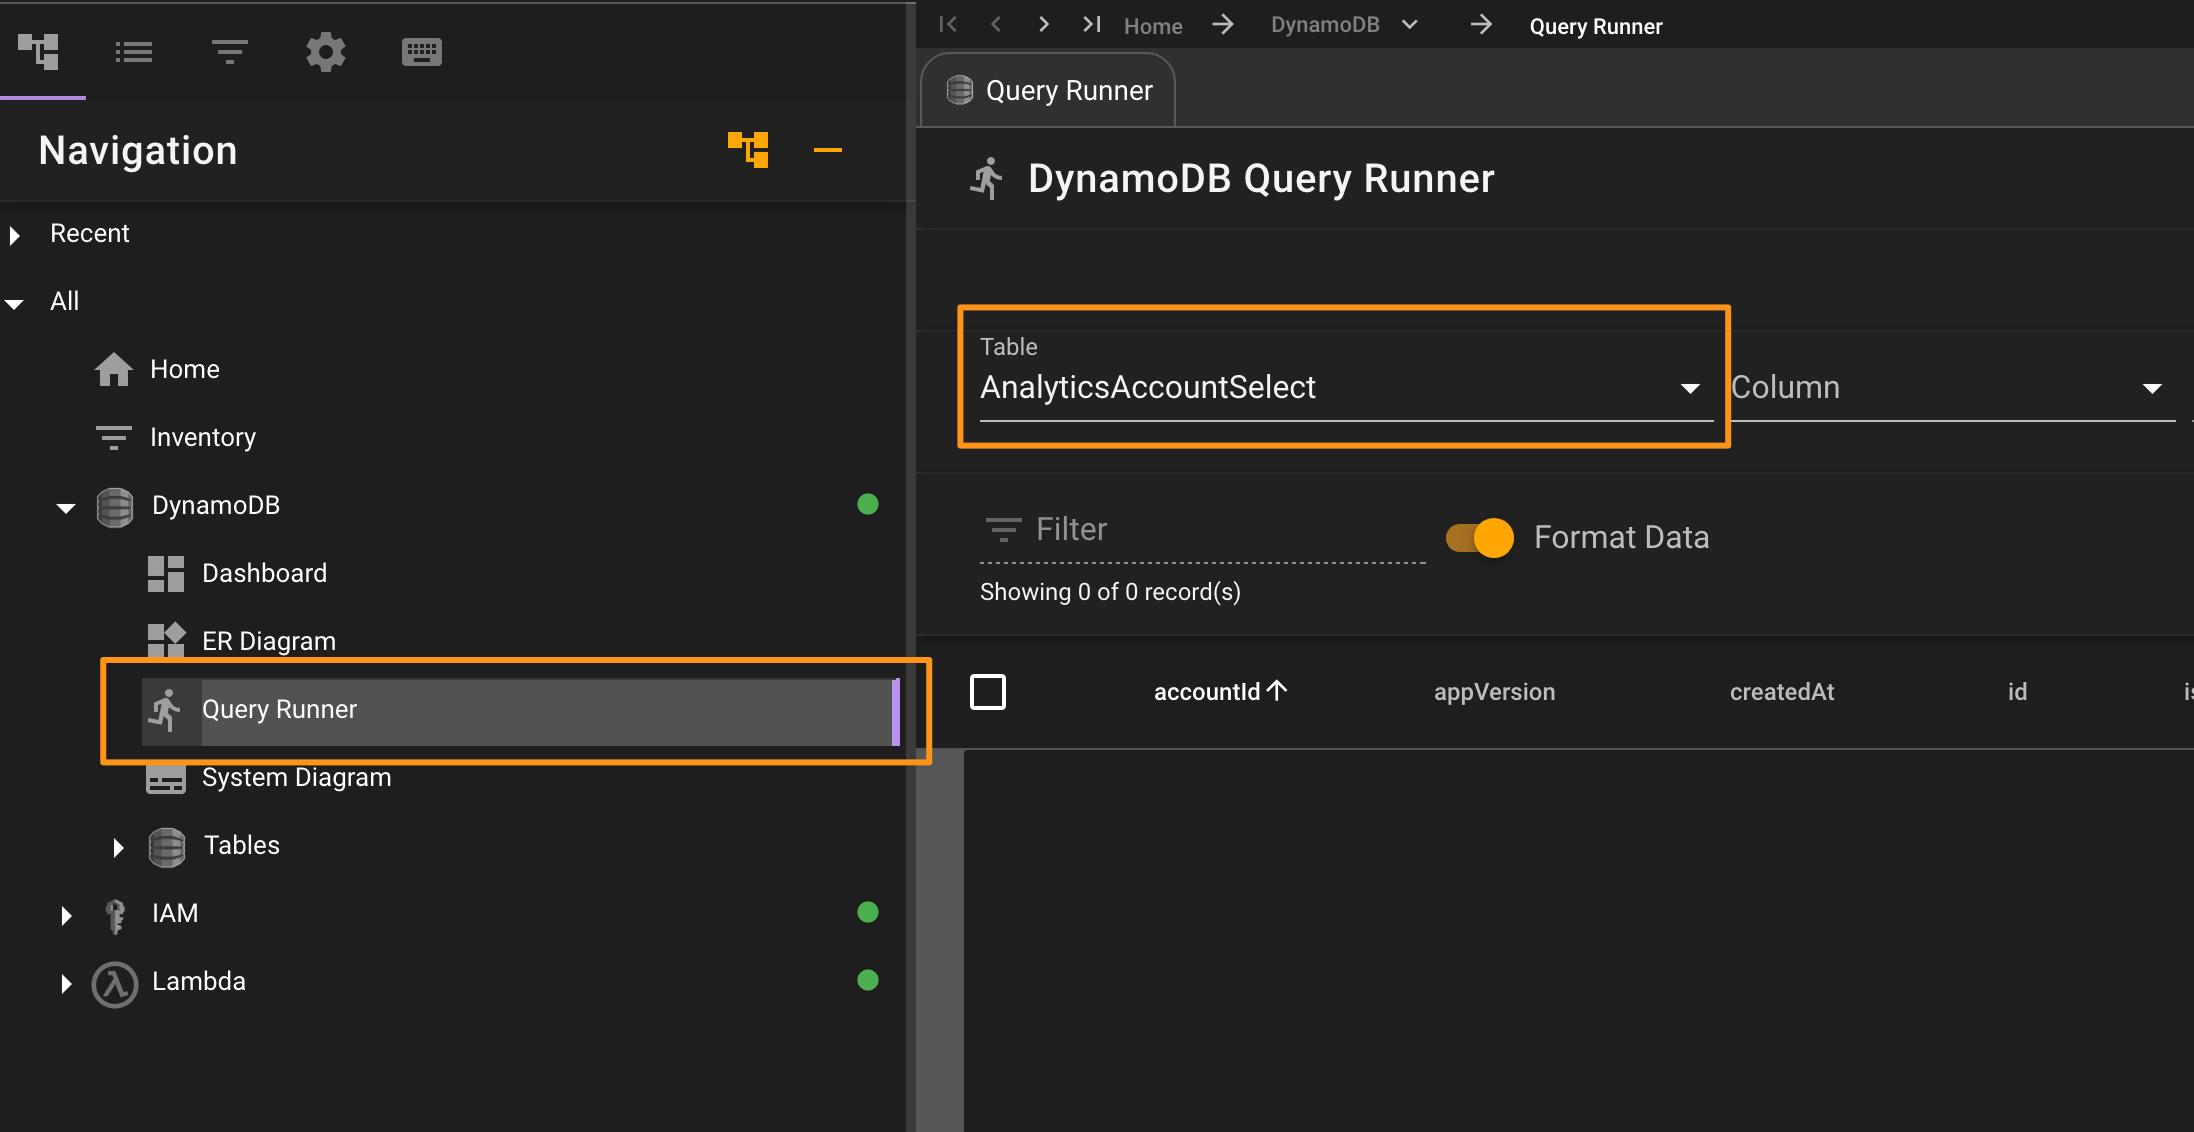 DynamoDB Query Runner